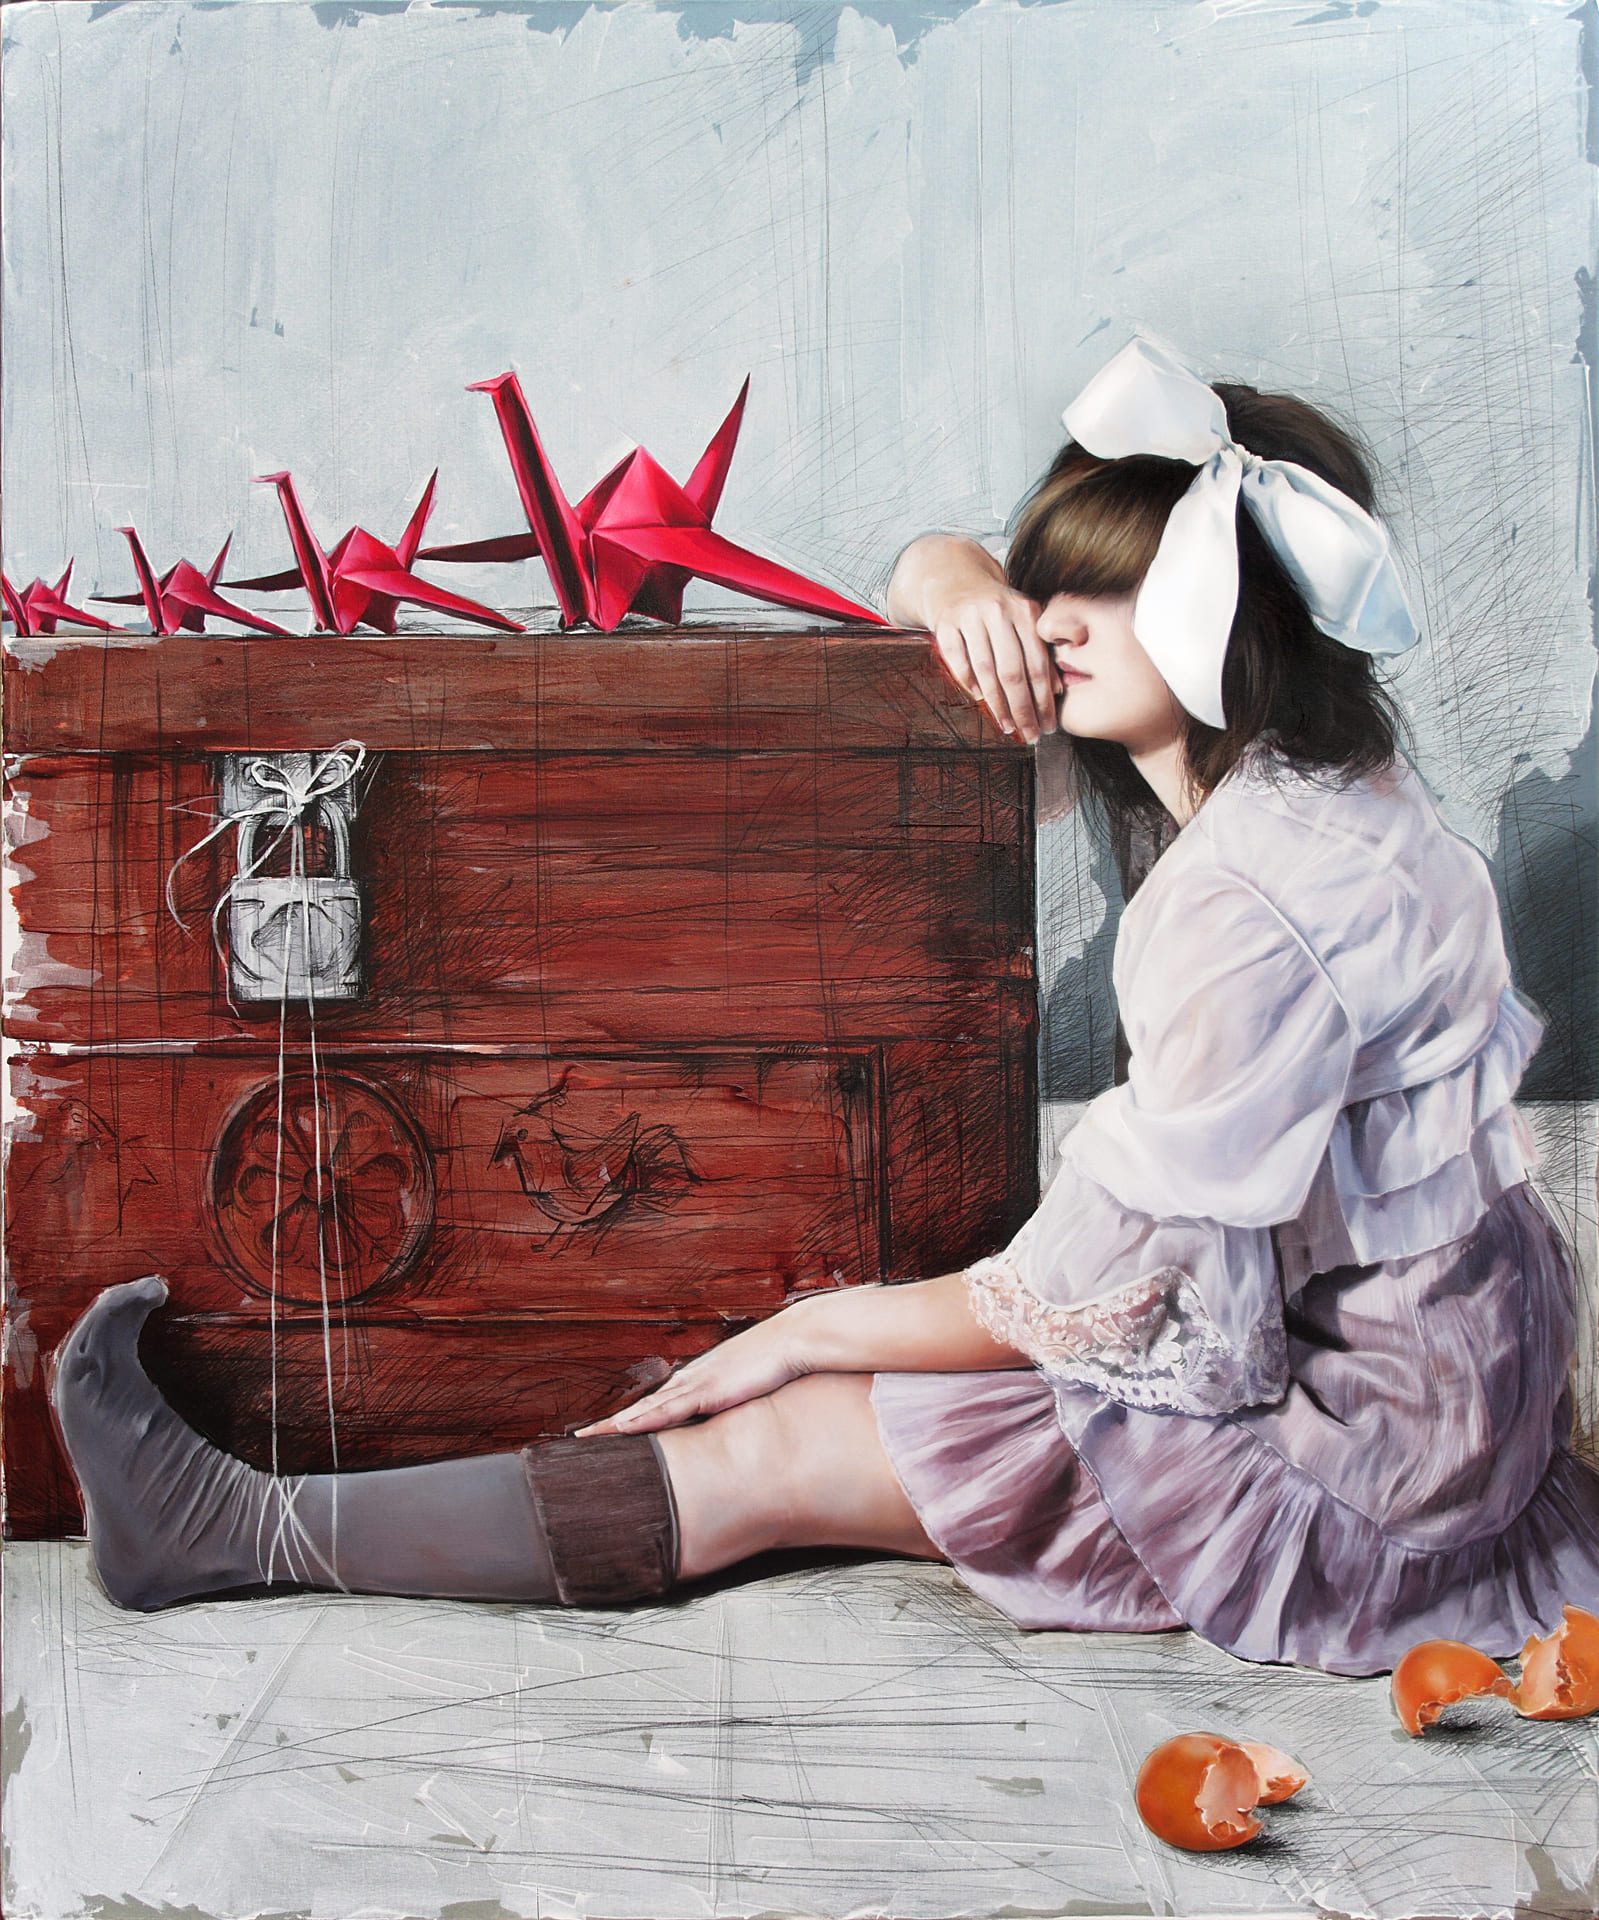 art contemporary, ombra